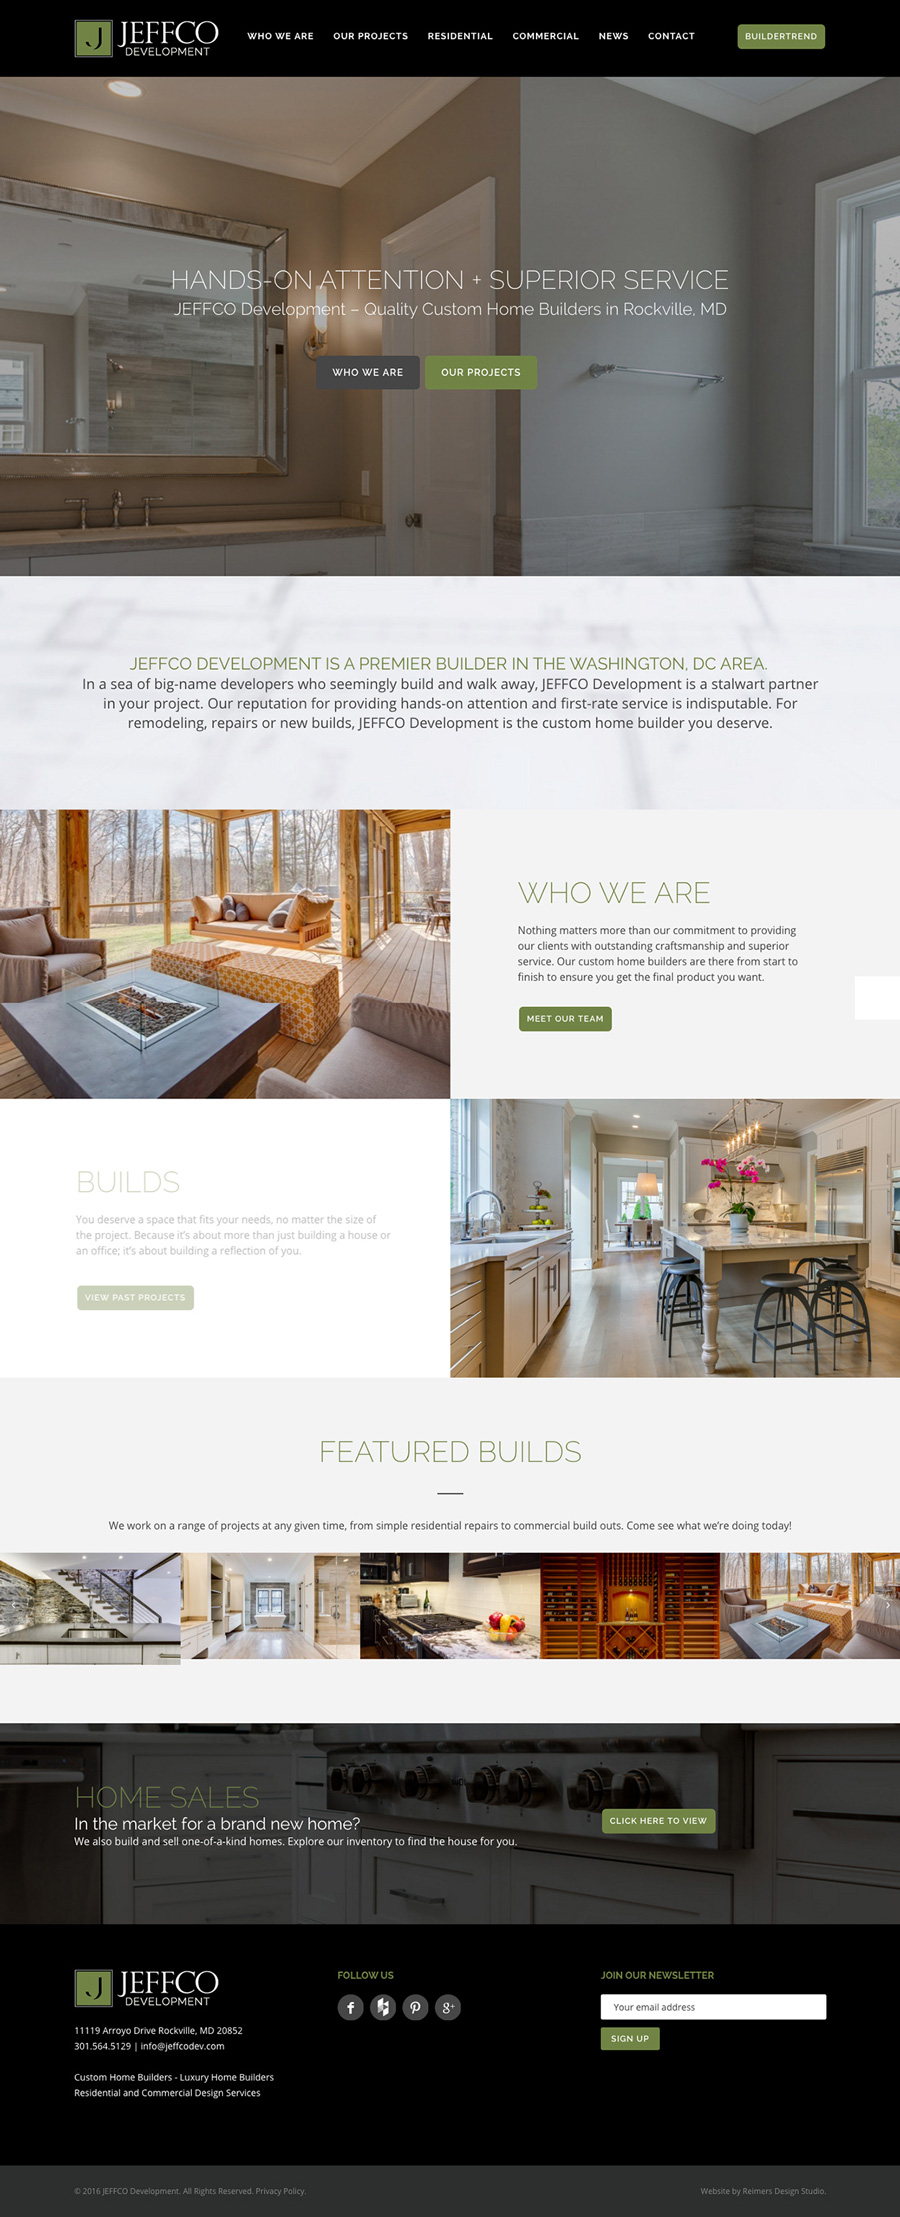 Jeffco Development Website Design